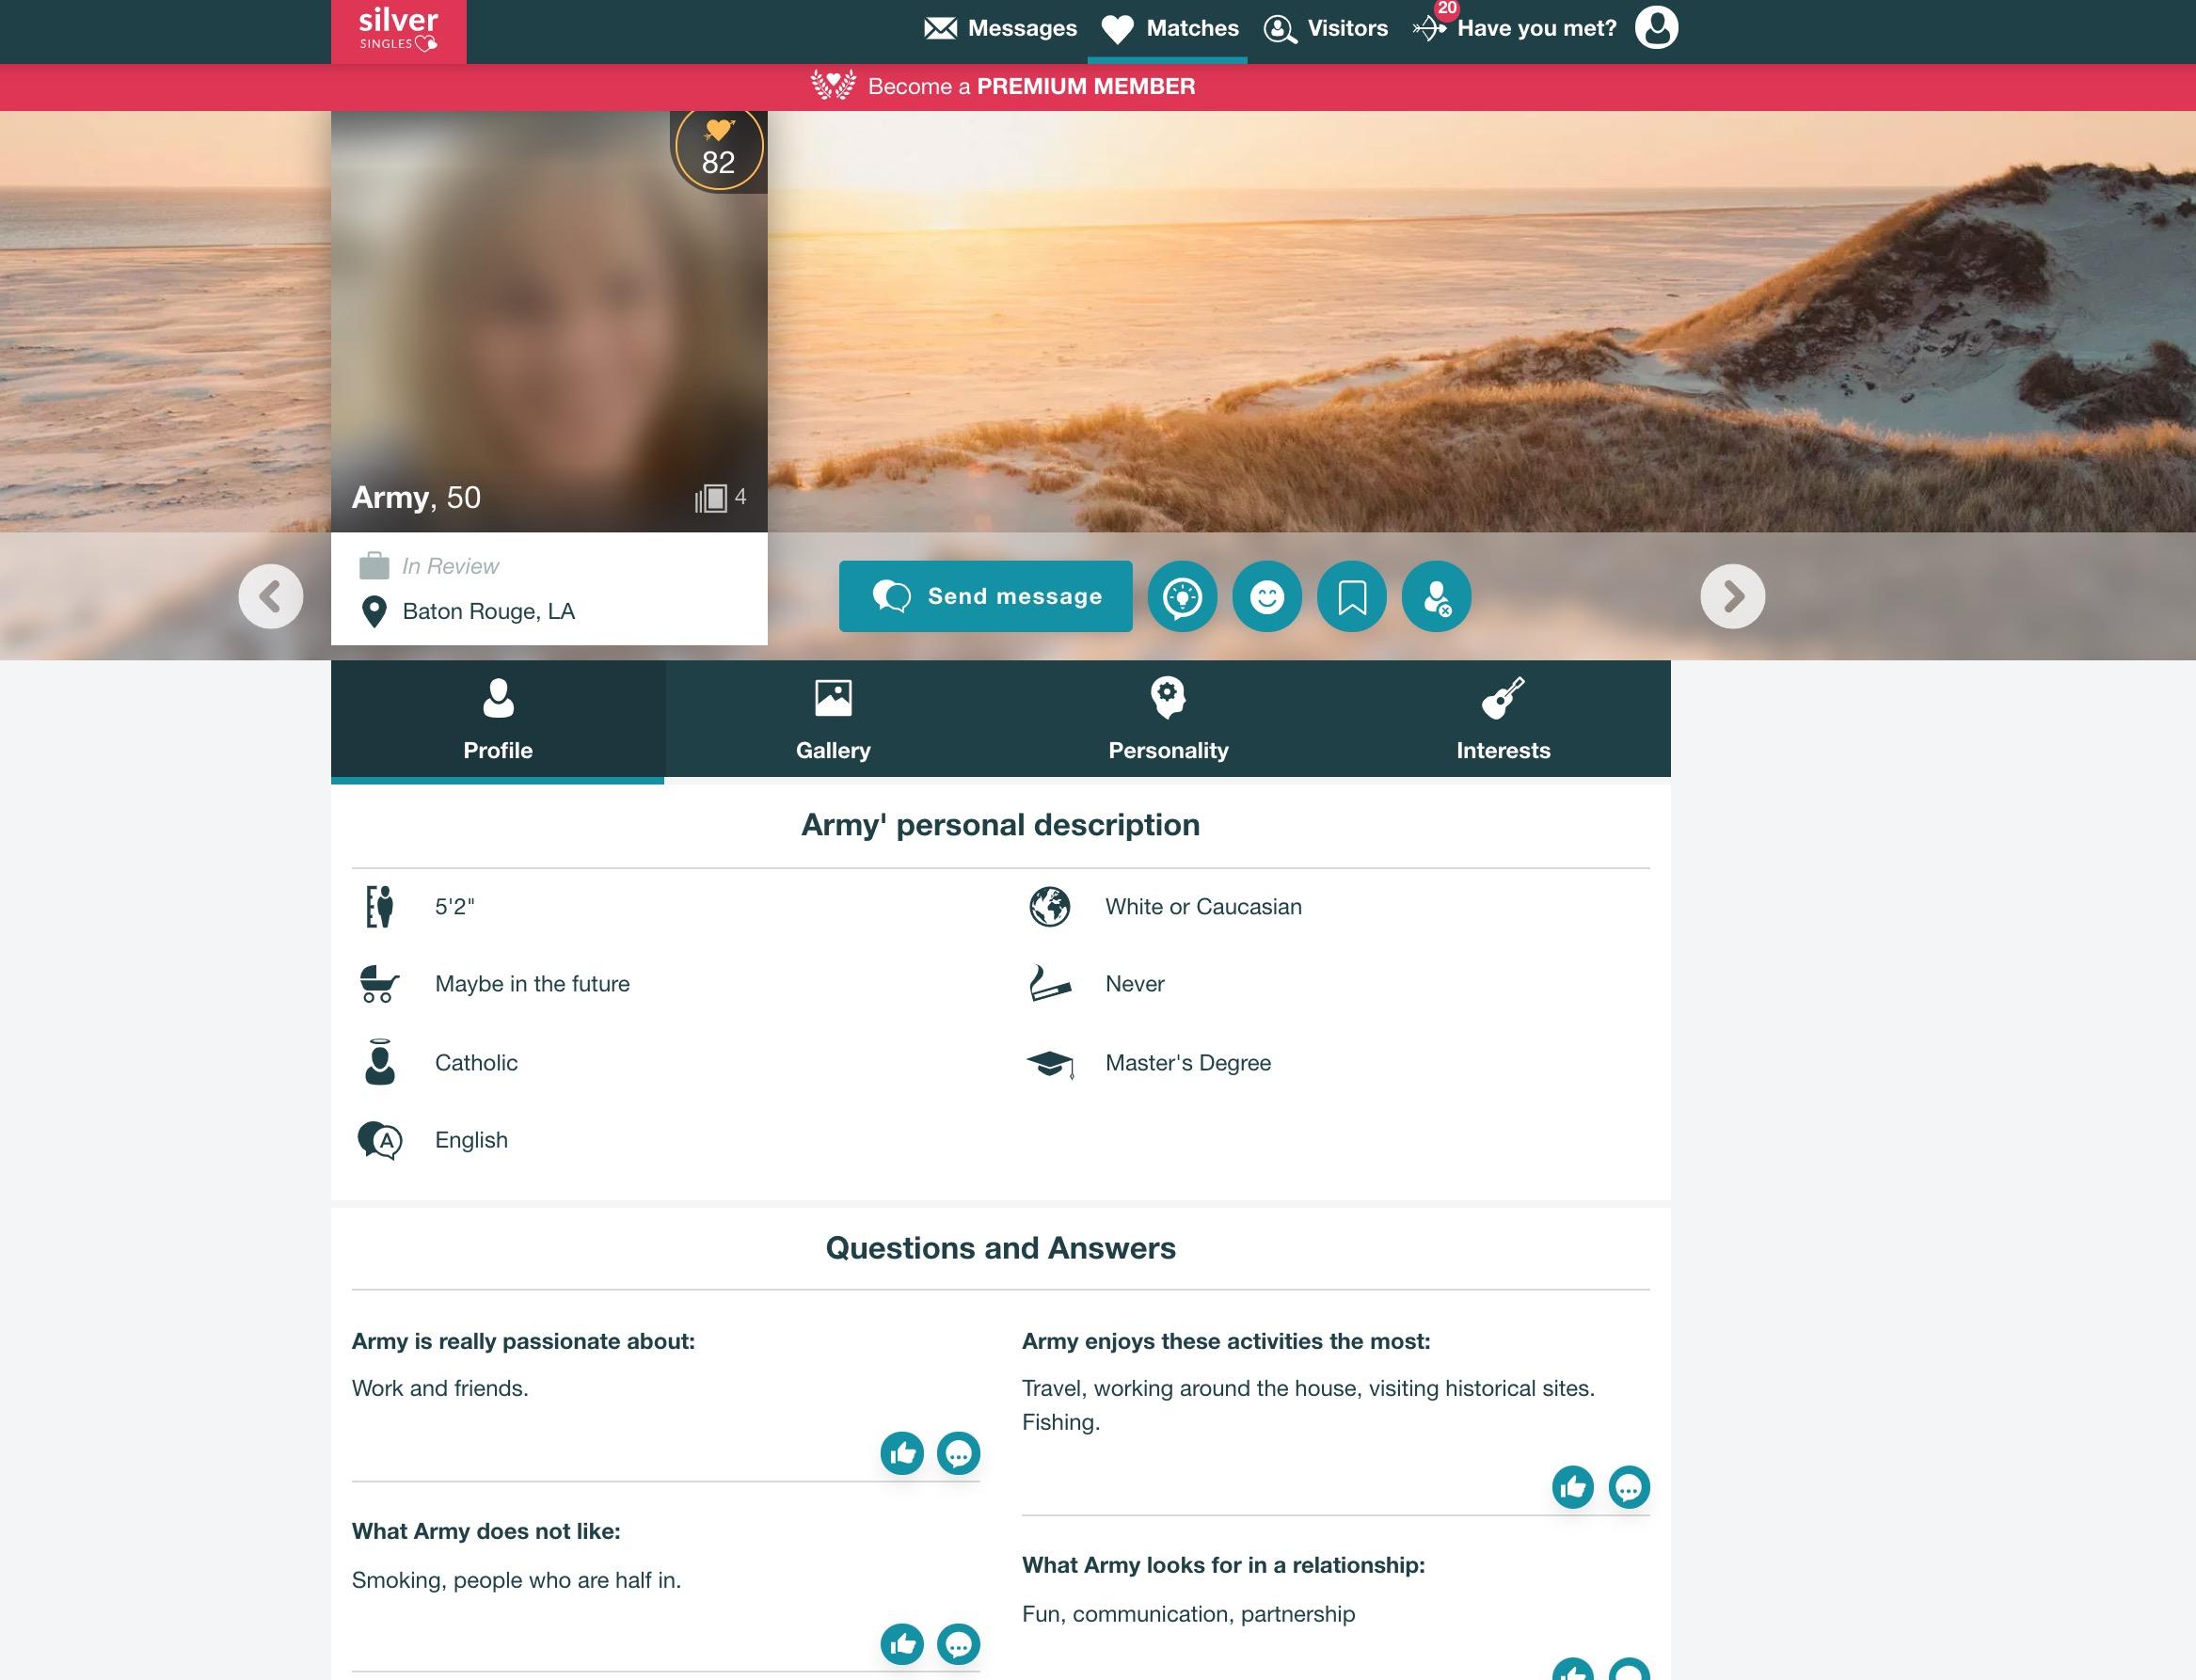 SilverSingles woman profile